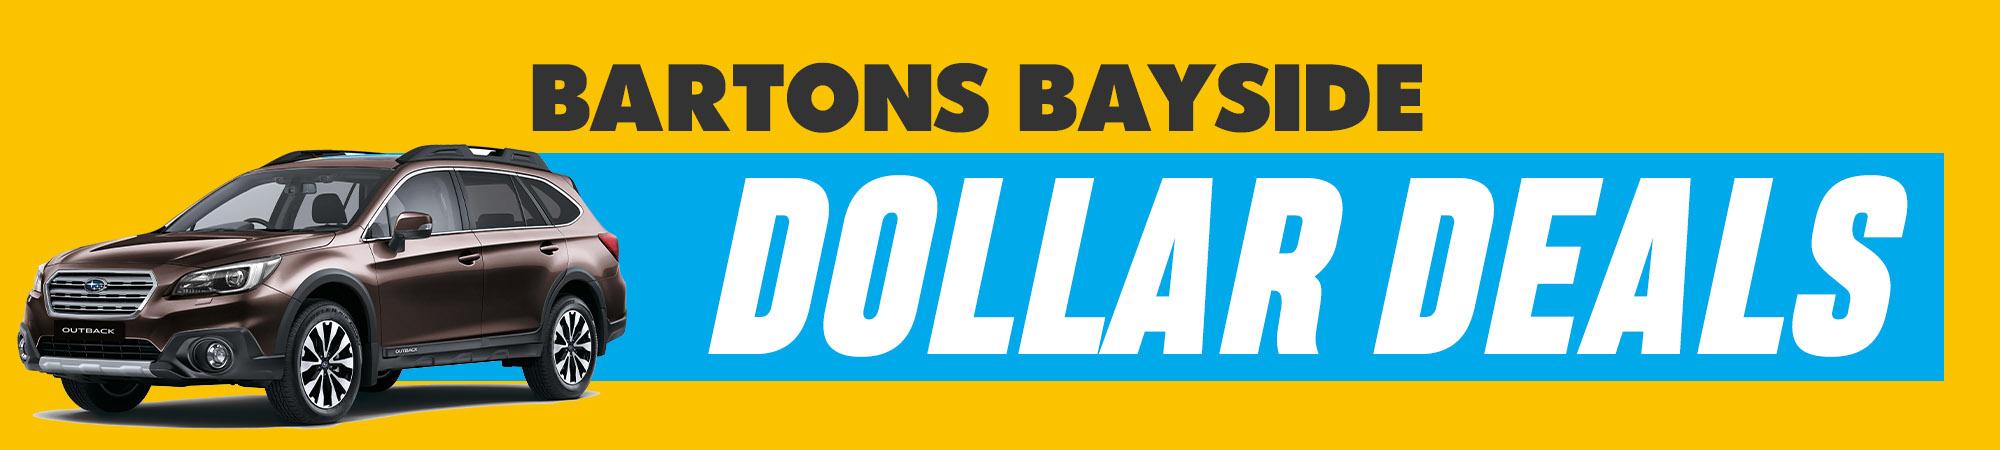 Bartons Bayside Dollar Deals